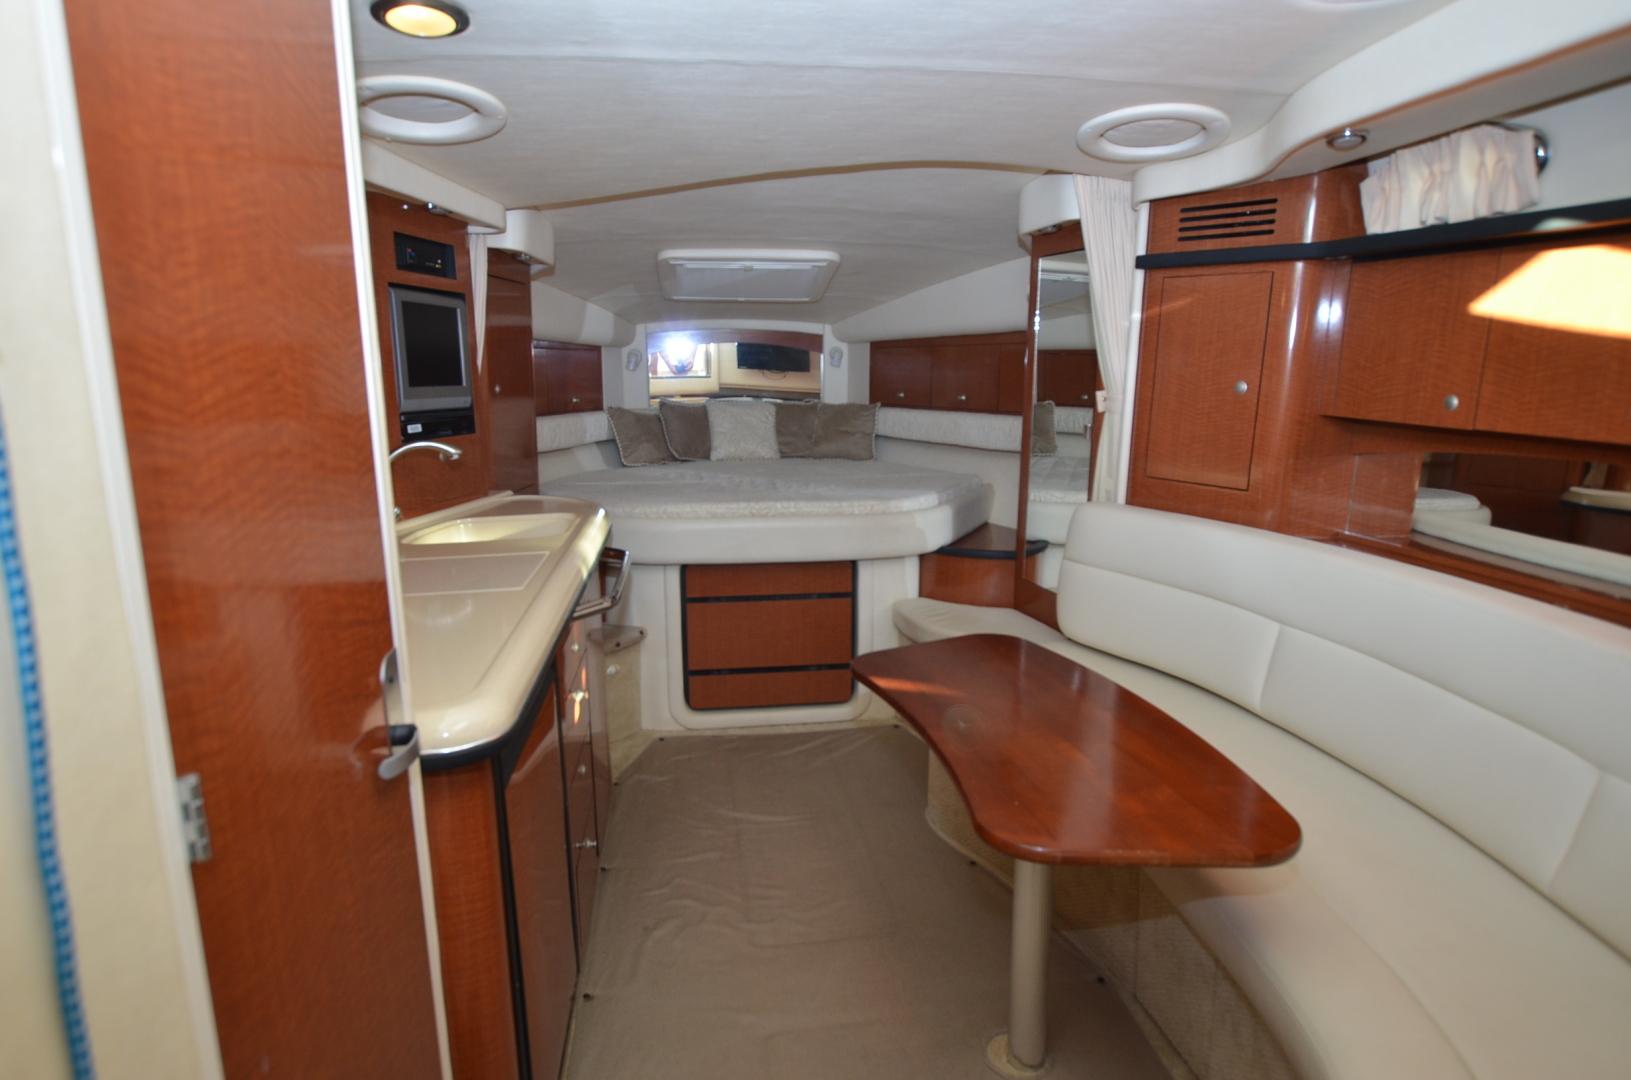 Sea Ray-340 Sundancer 2005-Better Place Palm Harbor-Florida-United States-1562816 | Thumbnail